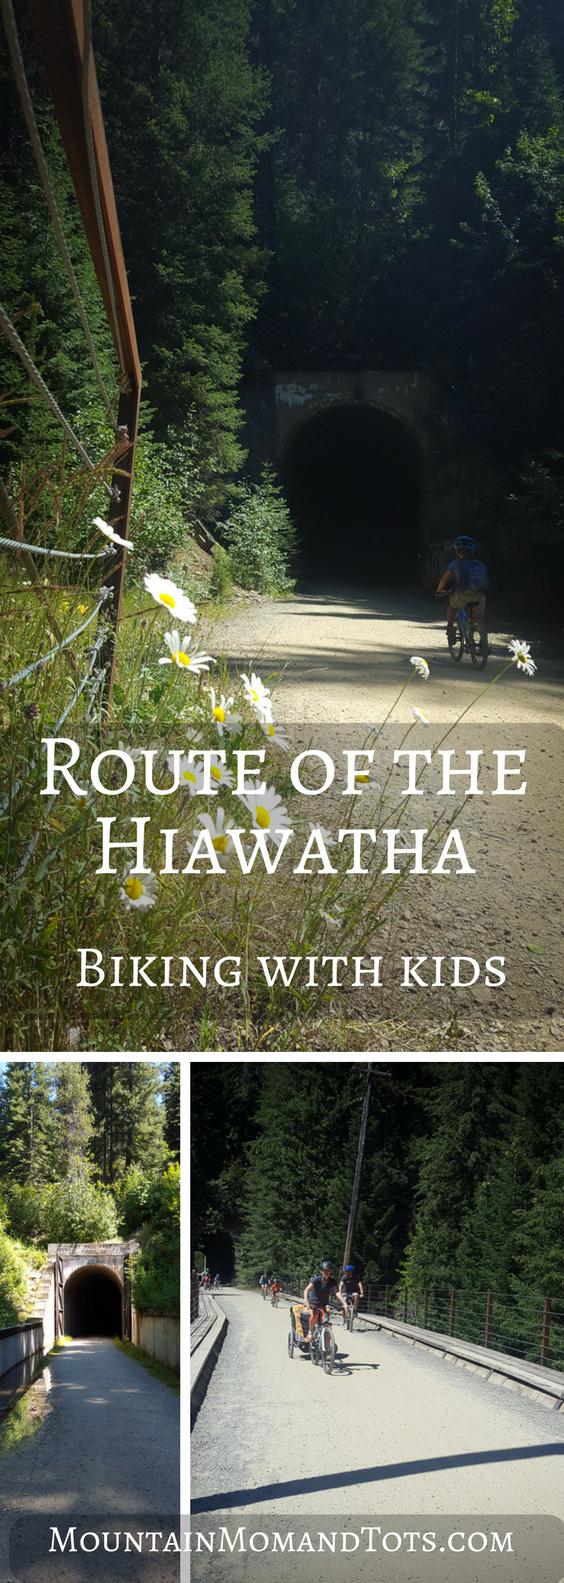 Route of the Hiawatha Pin